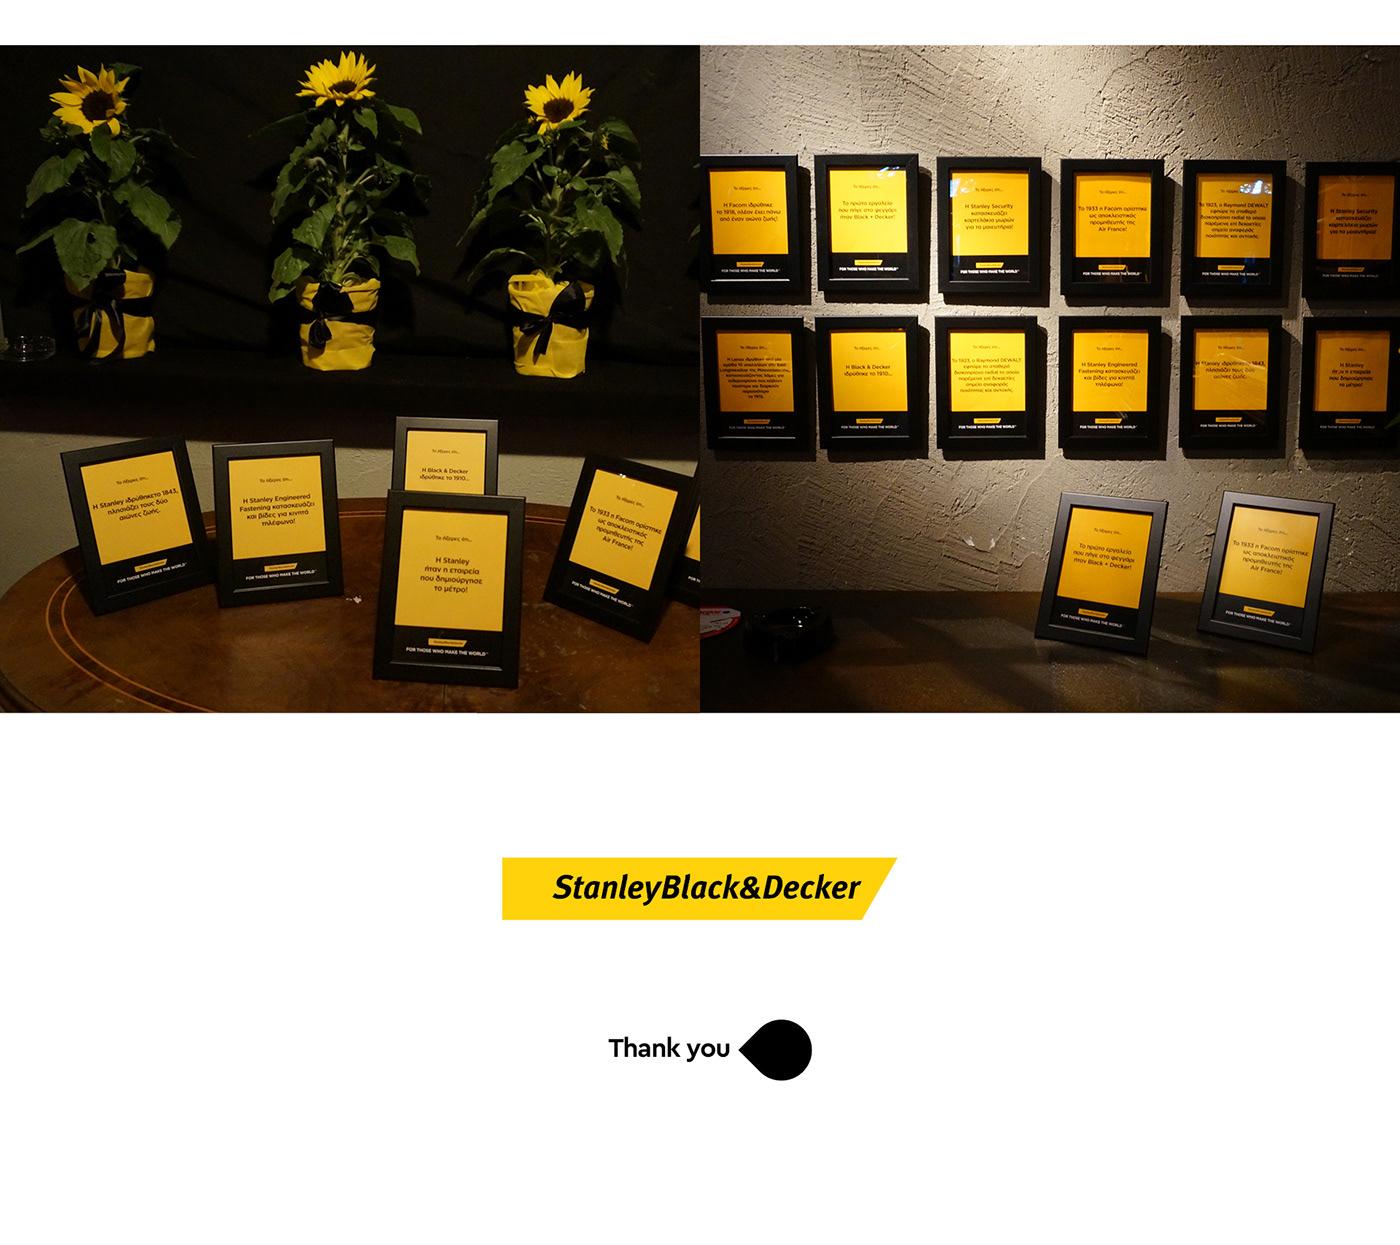 Event exhibishion decoration Interior creative